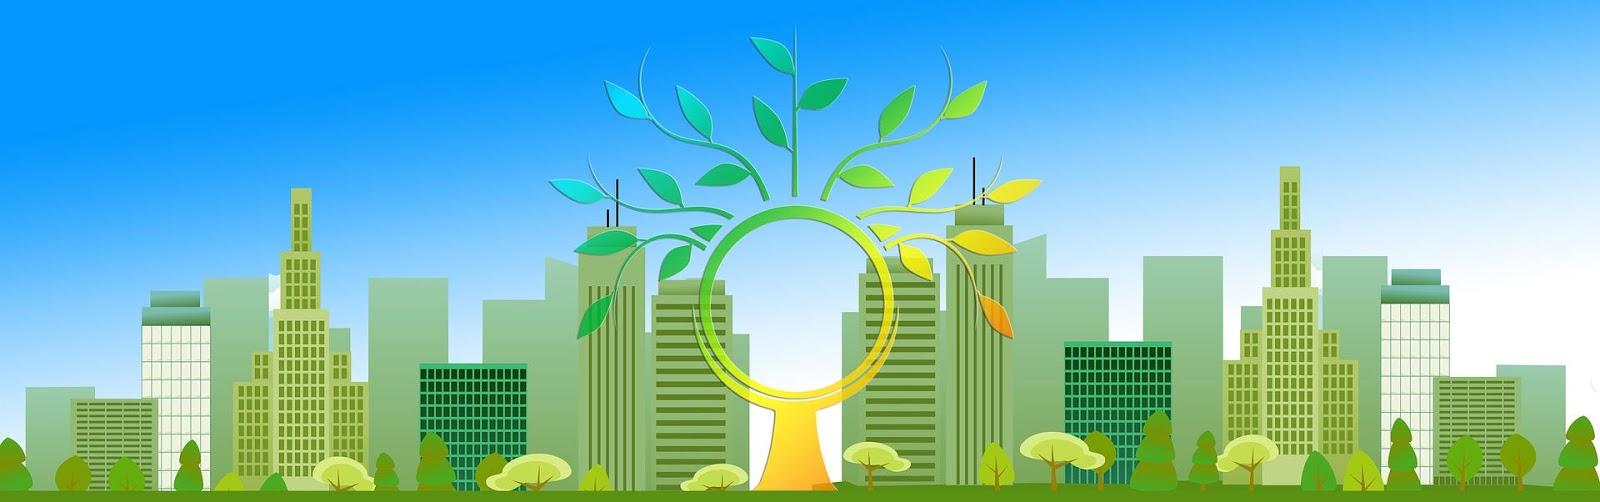 Metabolismo Urbano; Análisis microbiológico en aguas residuales